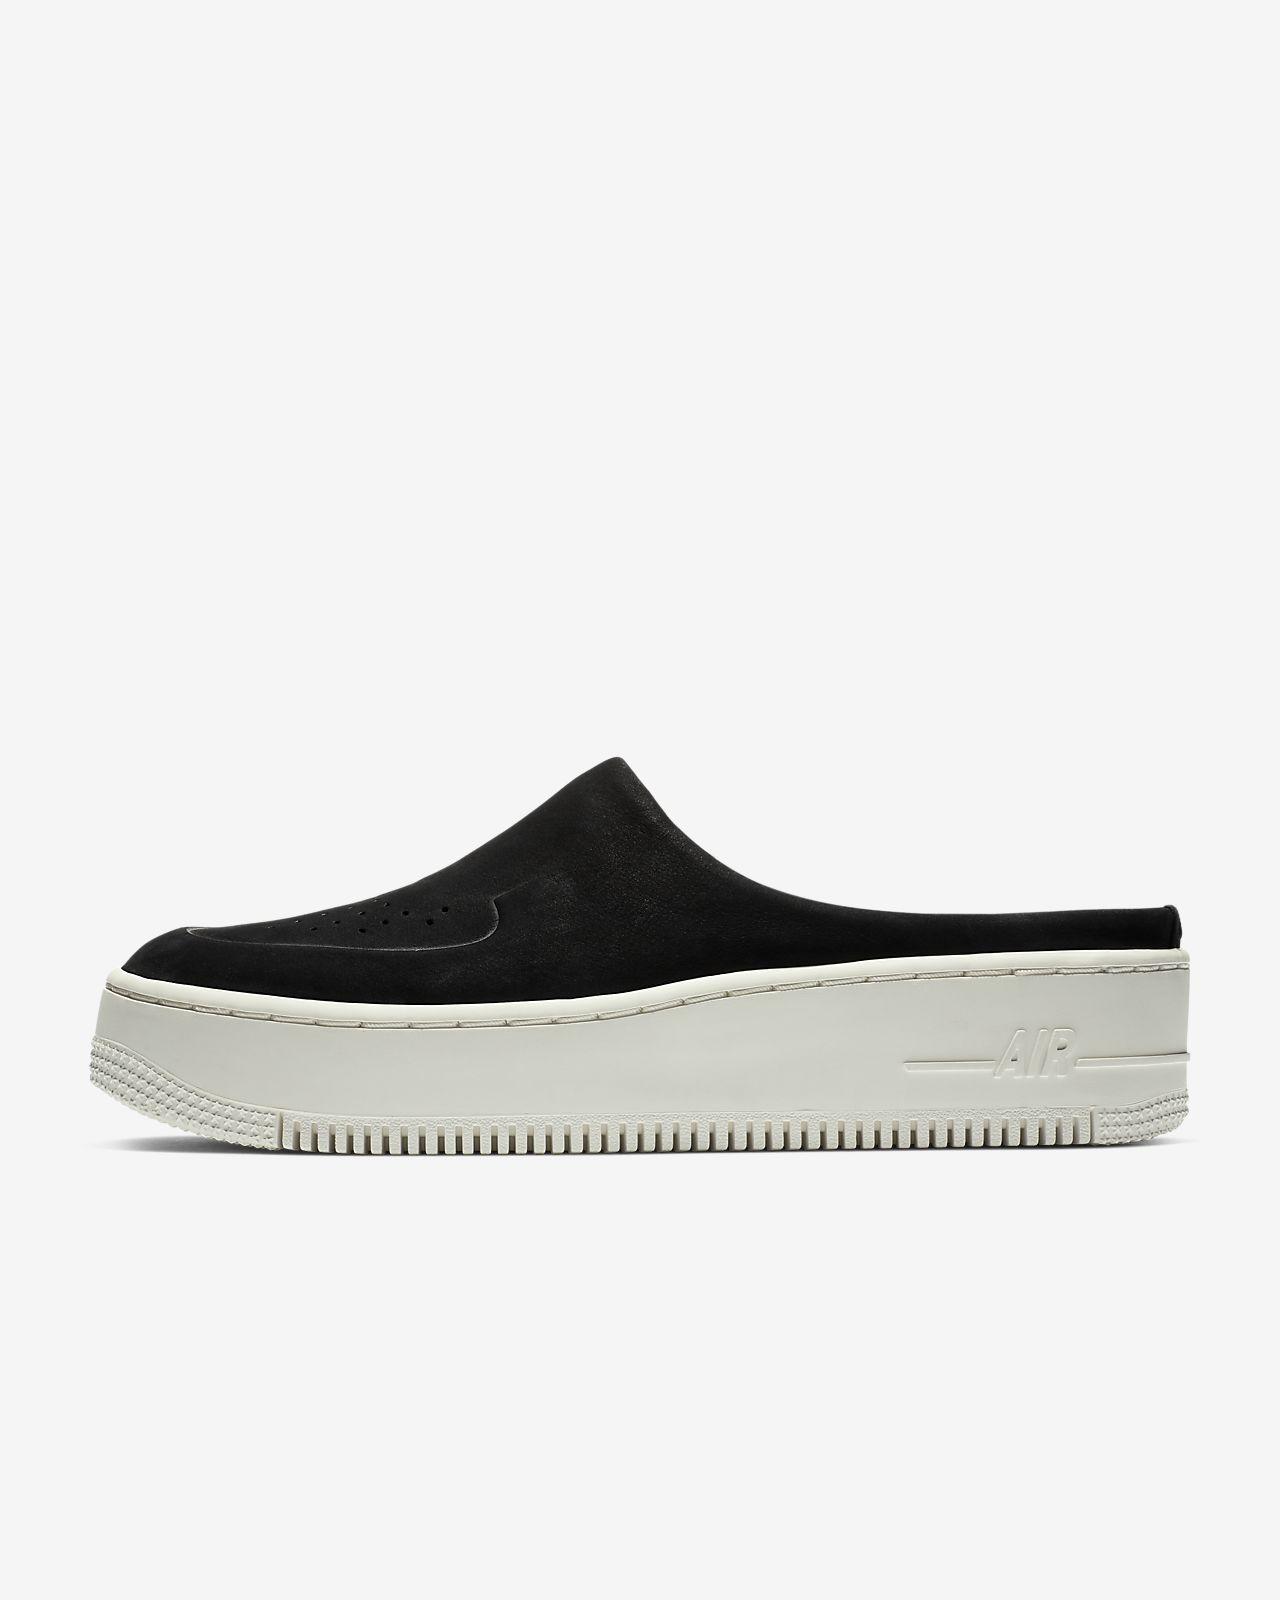 Dámská bota Nike Air Force 1 Lover XX Premium